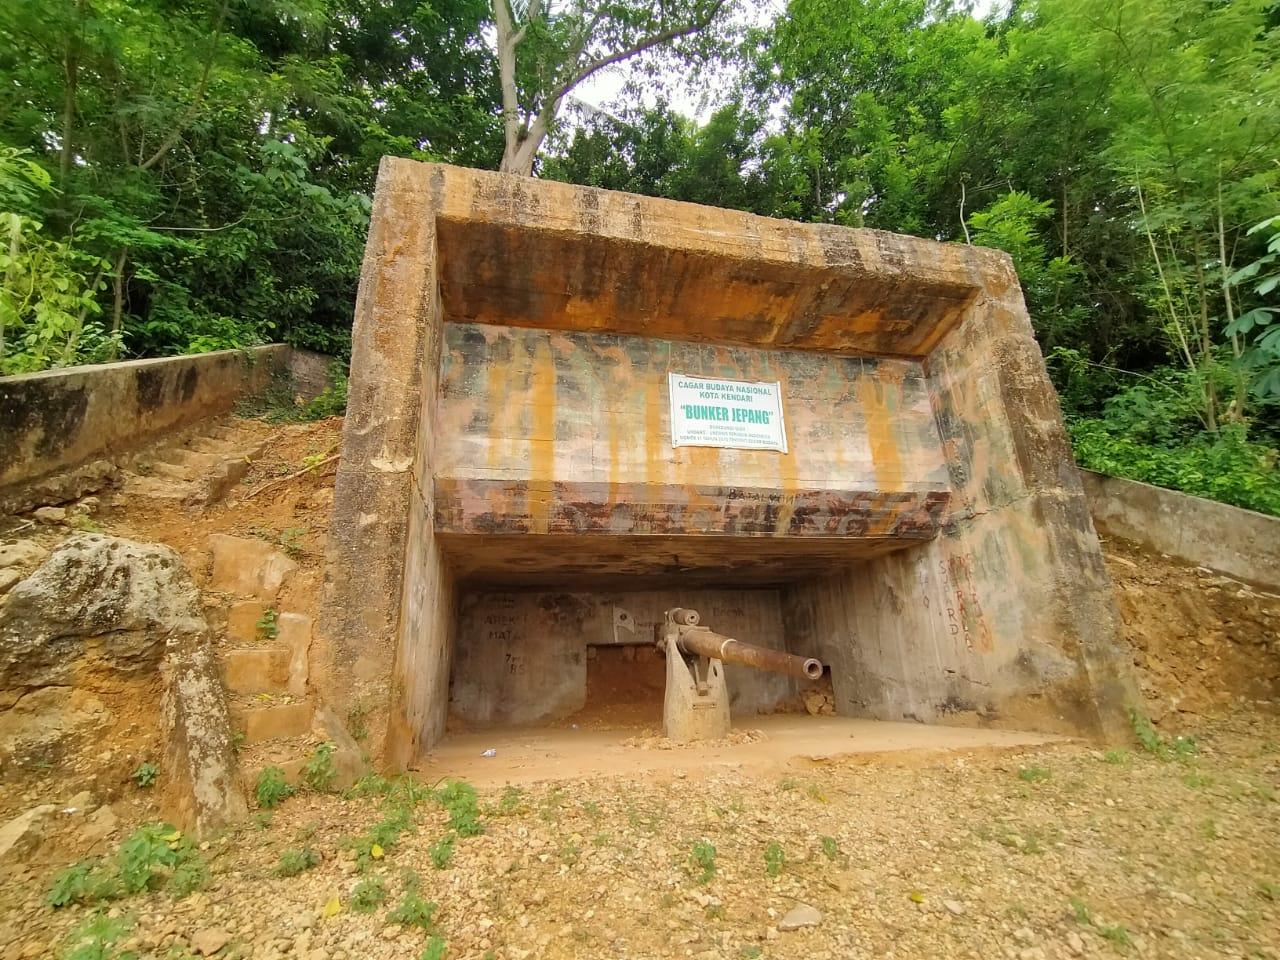 Meriam di dalam bungker Jepang di lereng bukit di Mata (dok. Lasak.id)